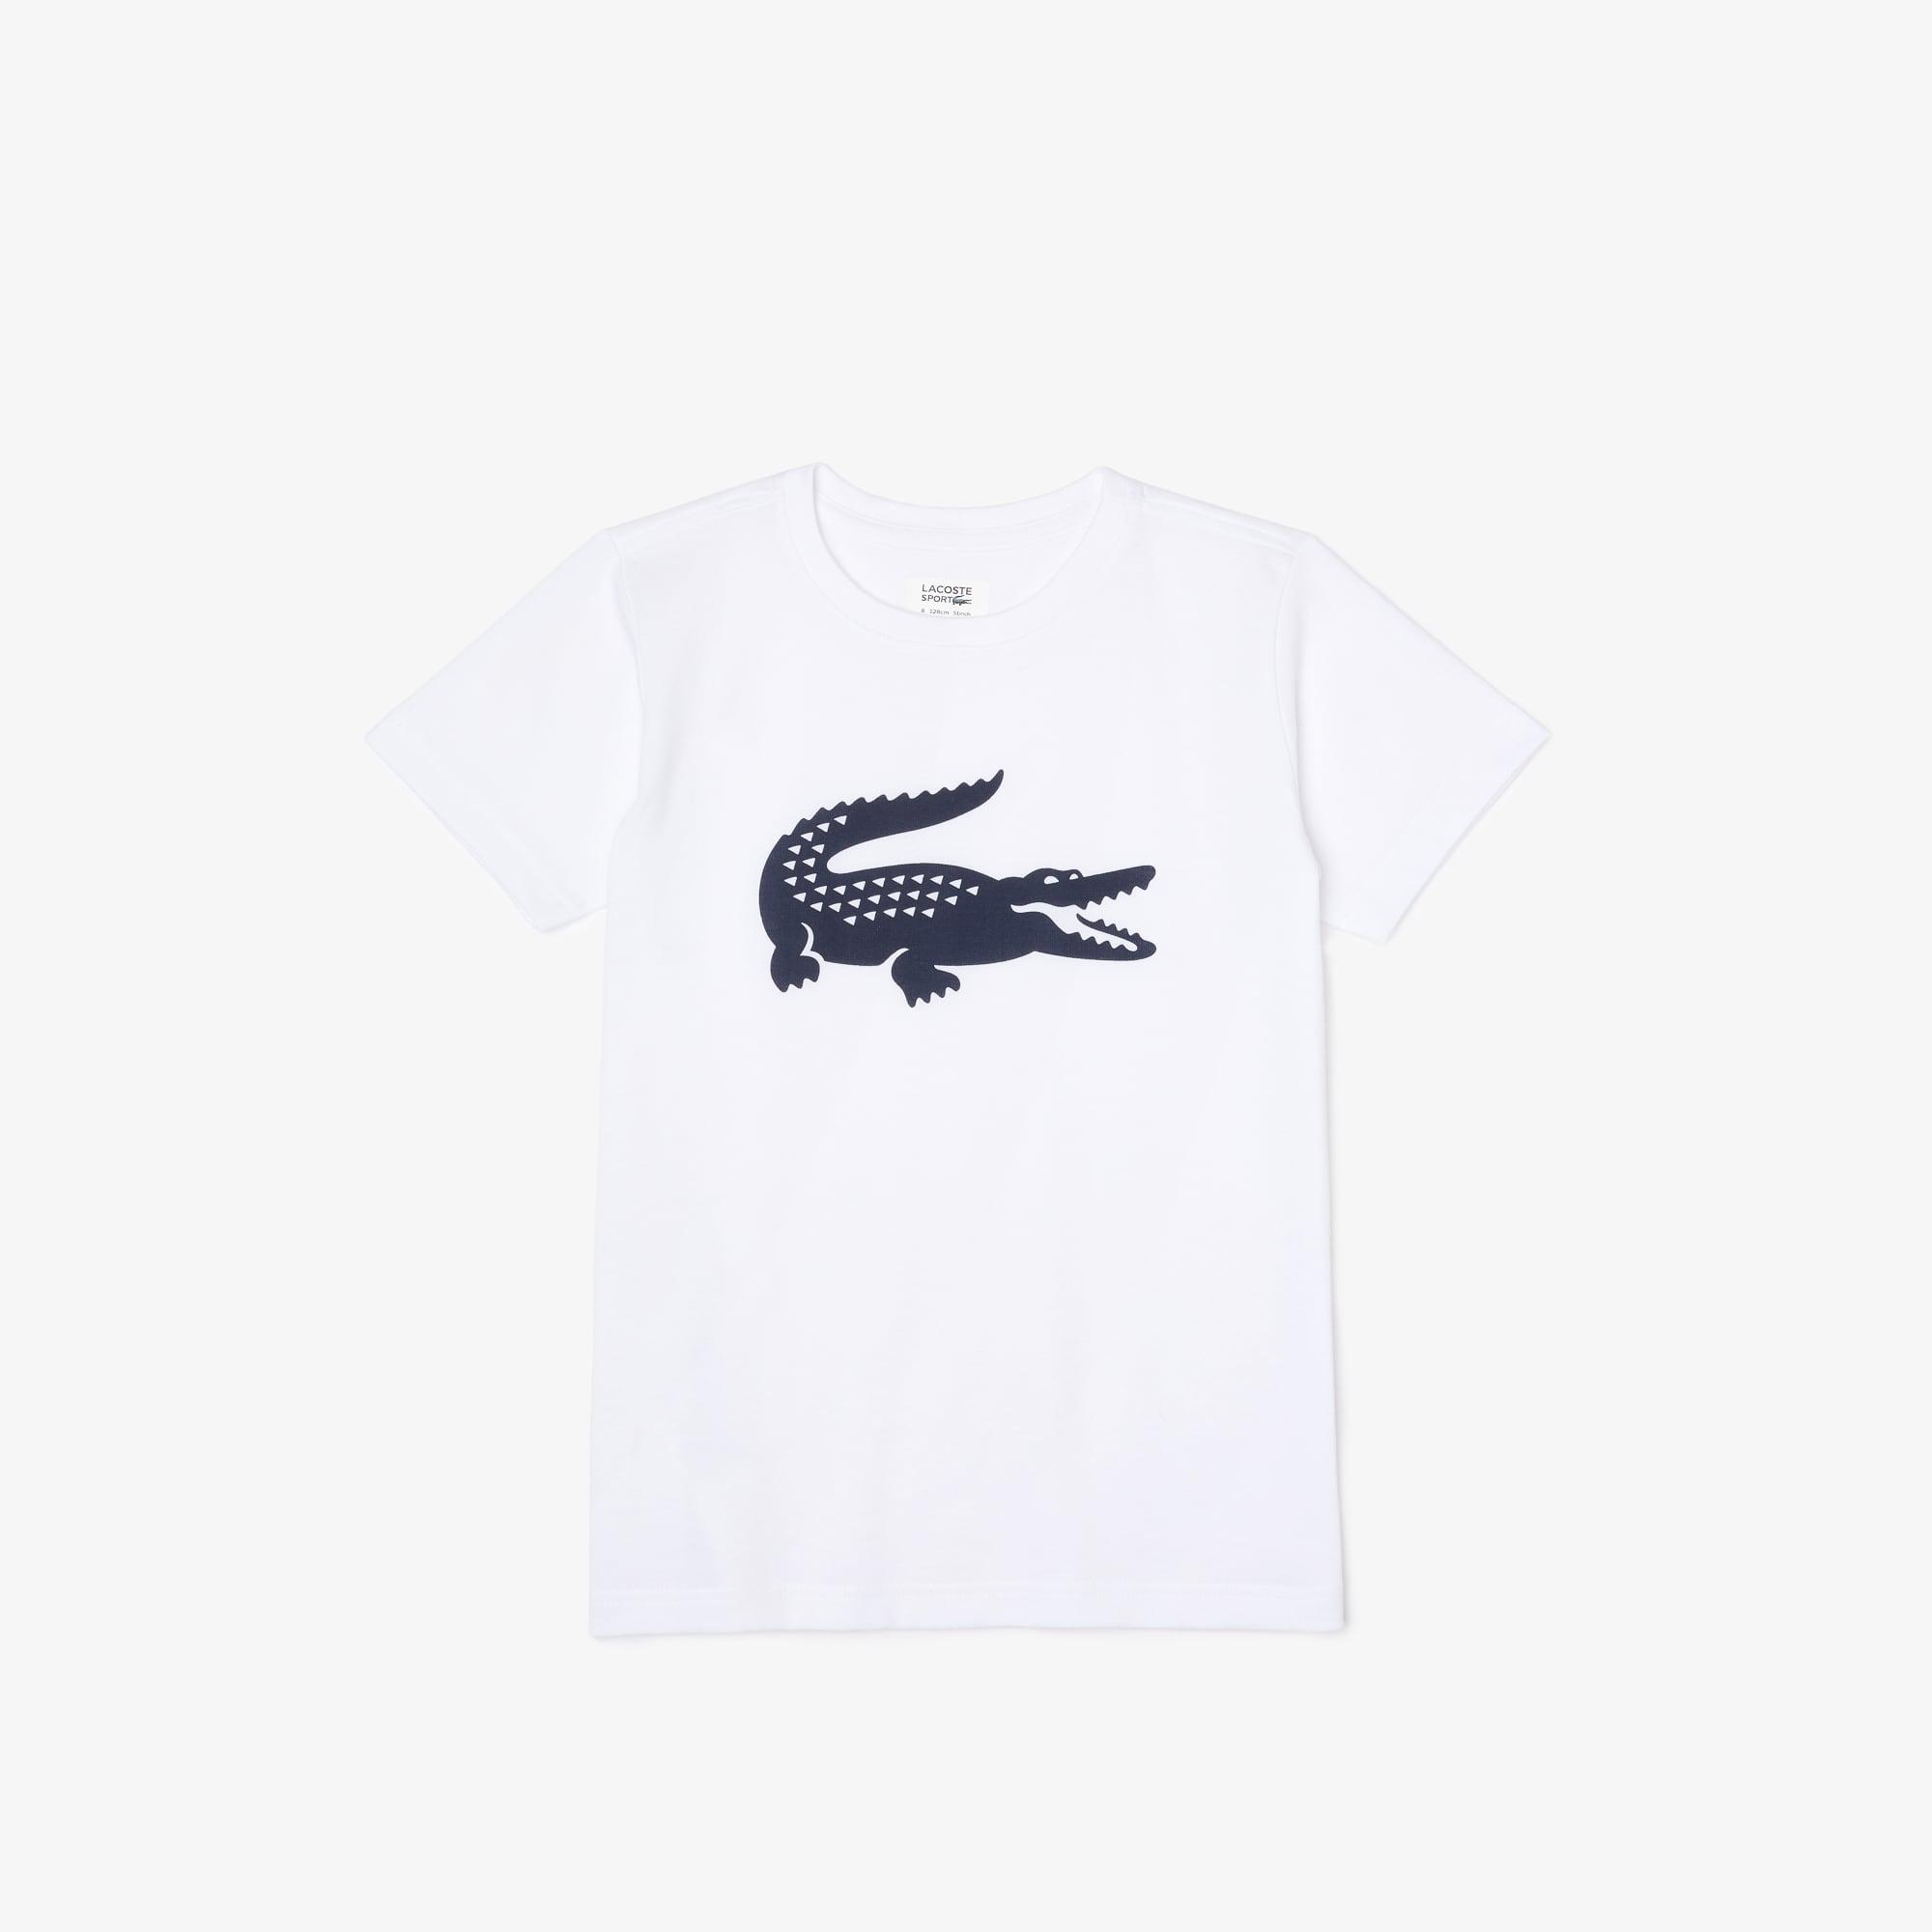 Lacoste - Camiseta infantil de tejido de punto técnico con gran cocodrilo Lacoste SPORT Tennis - 1